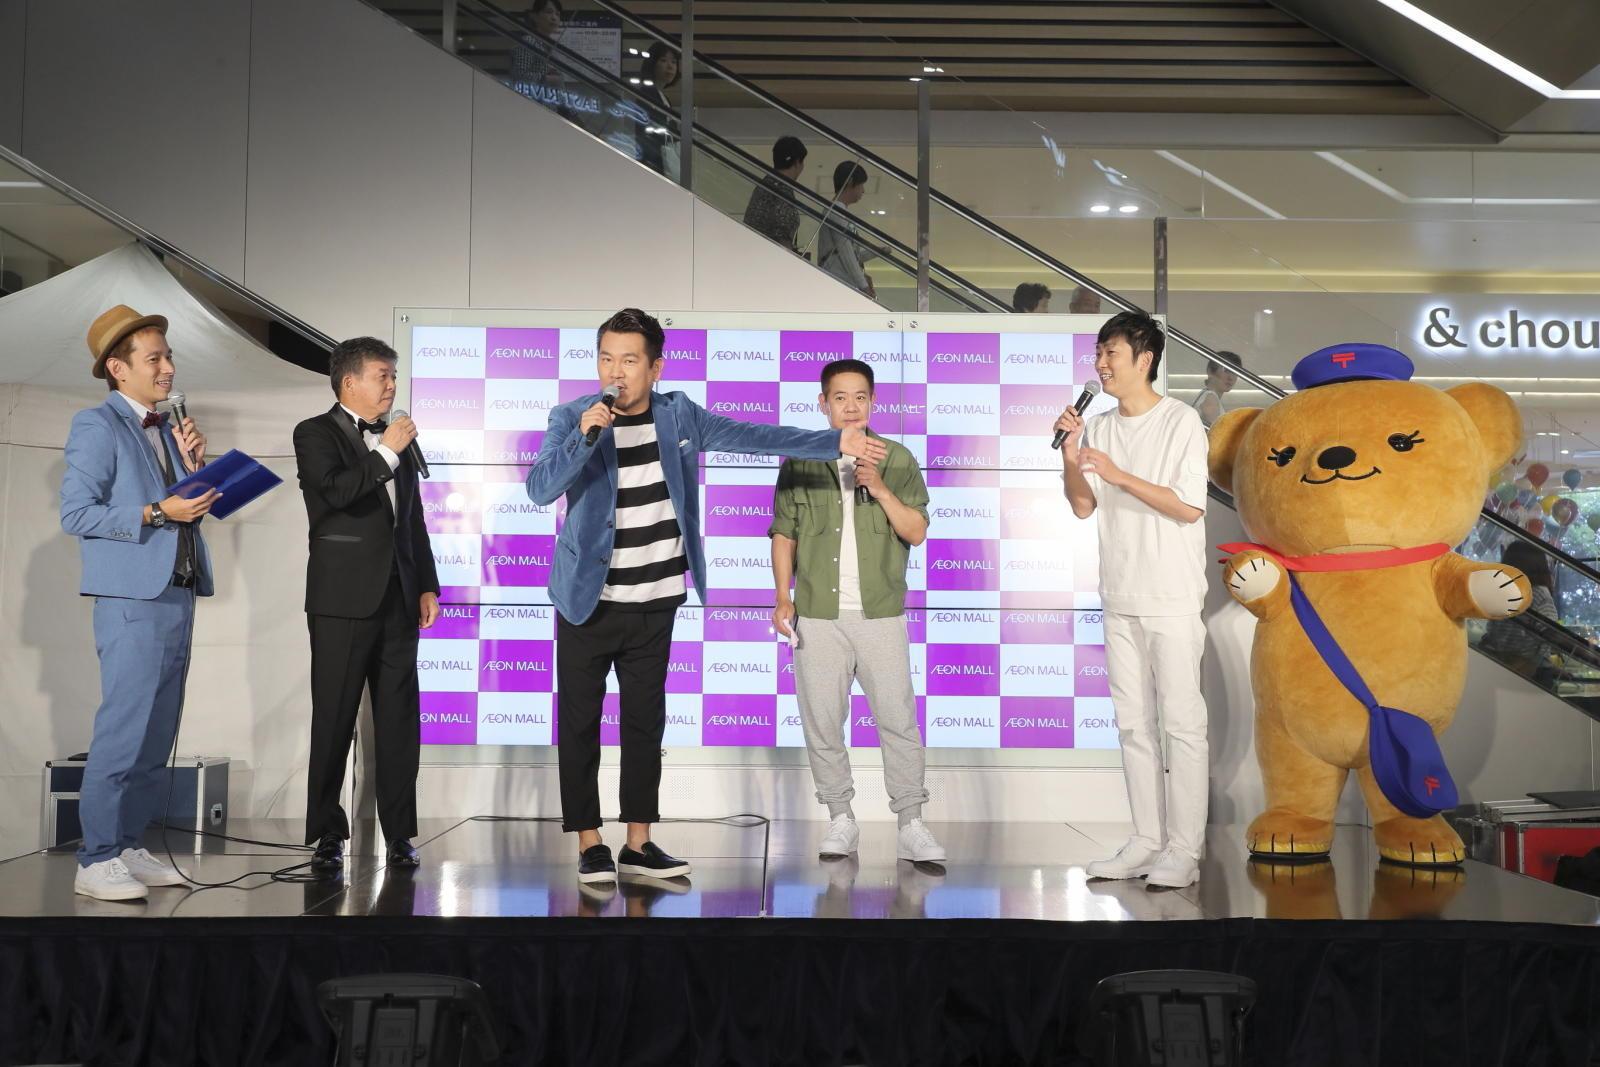 http://news.yoshimoto.co.jp/20170908234508-8159dd2ddb9f8436cfc6c738683052f9a39d7386.jpg